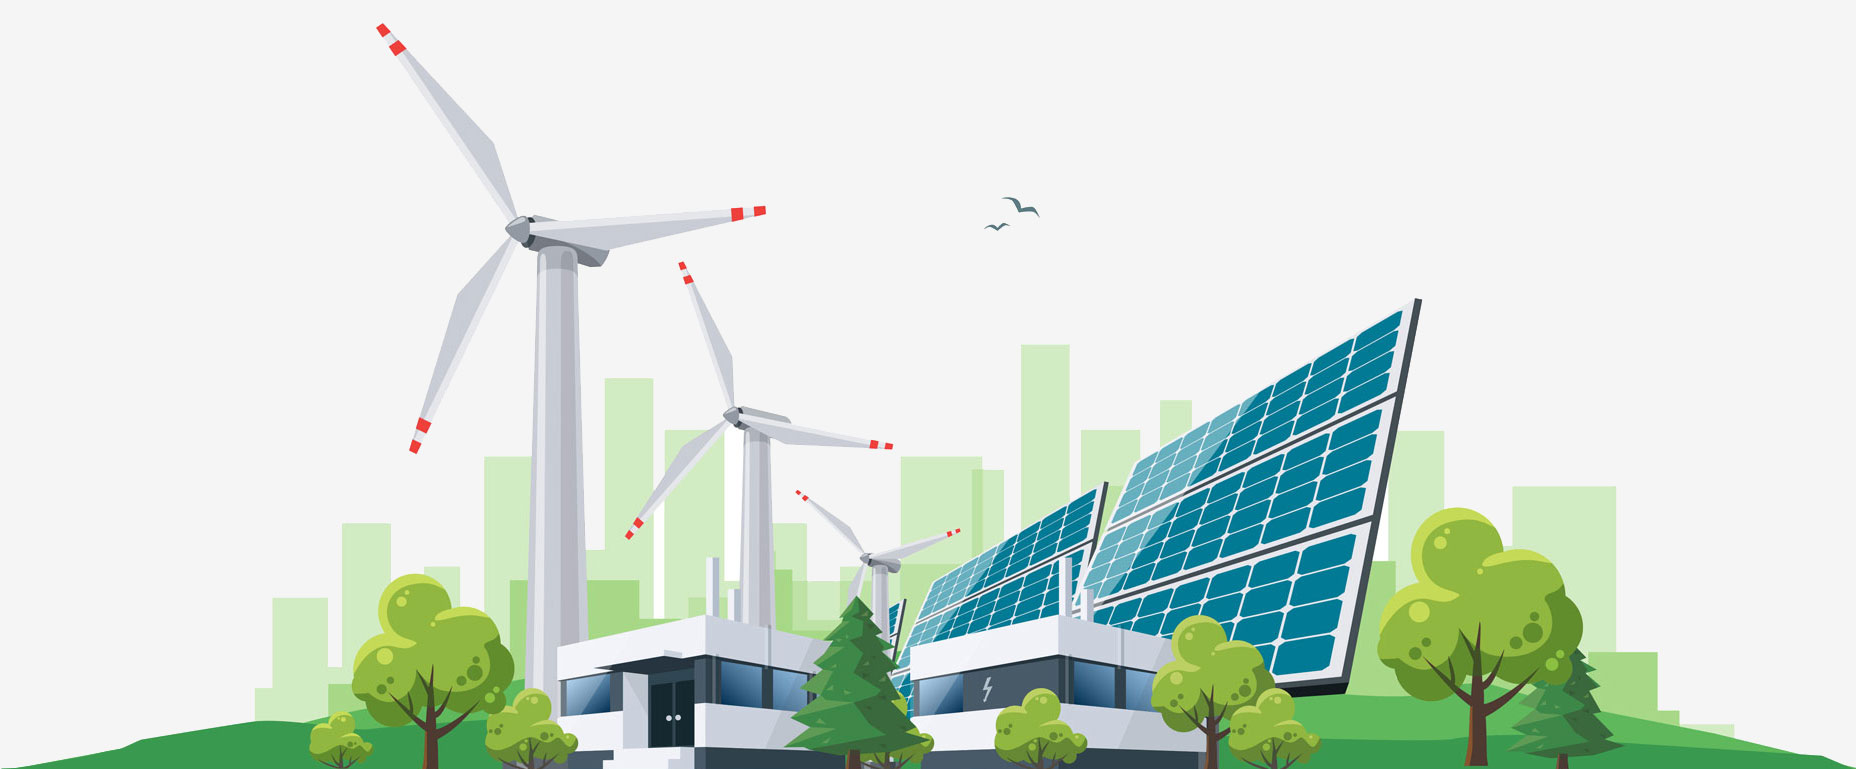 راهکار مدیریت خدمات فناوری اطلاعات صنعت انرژی